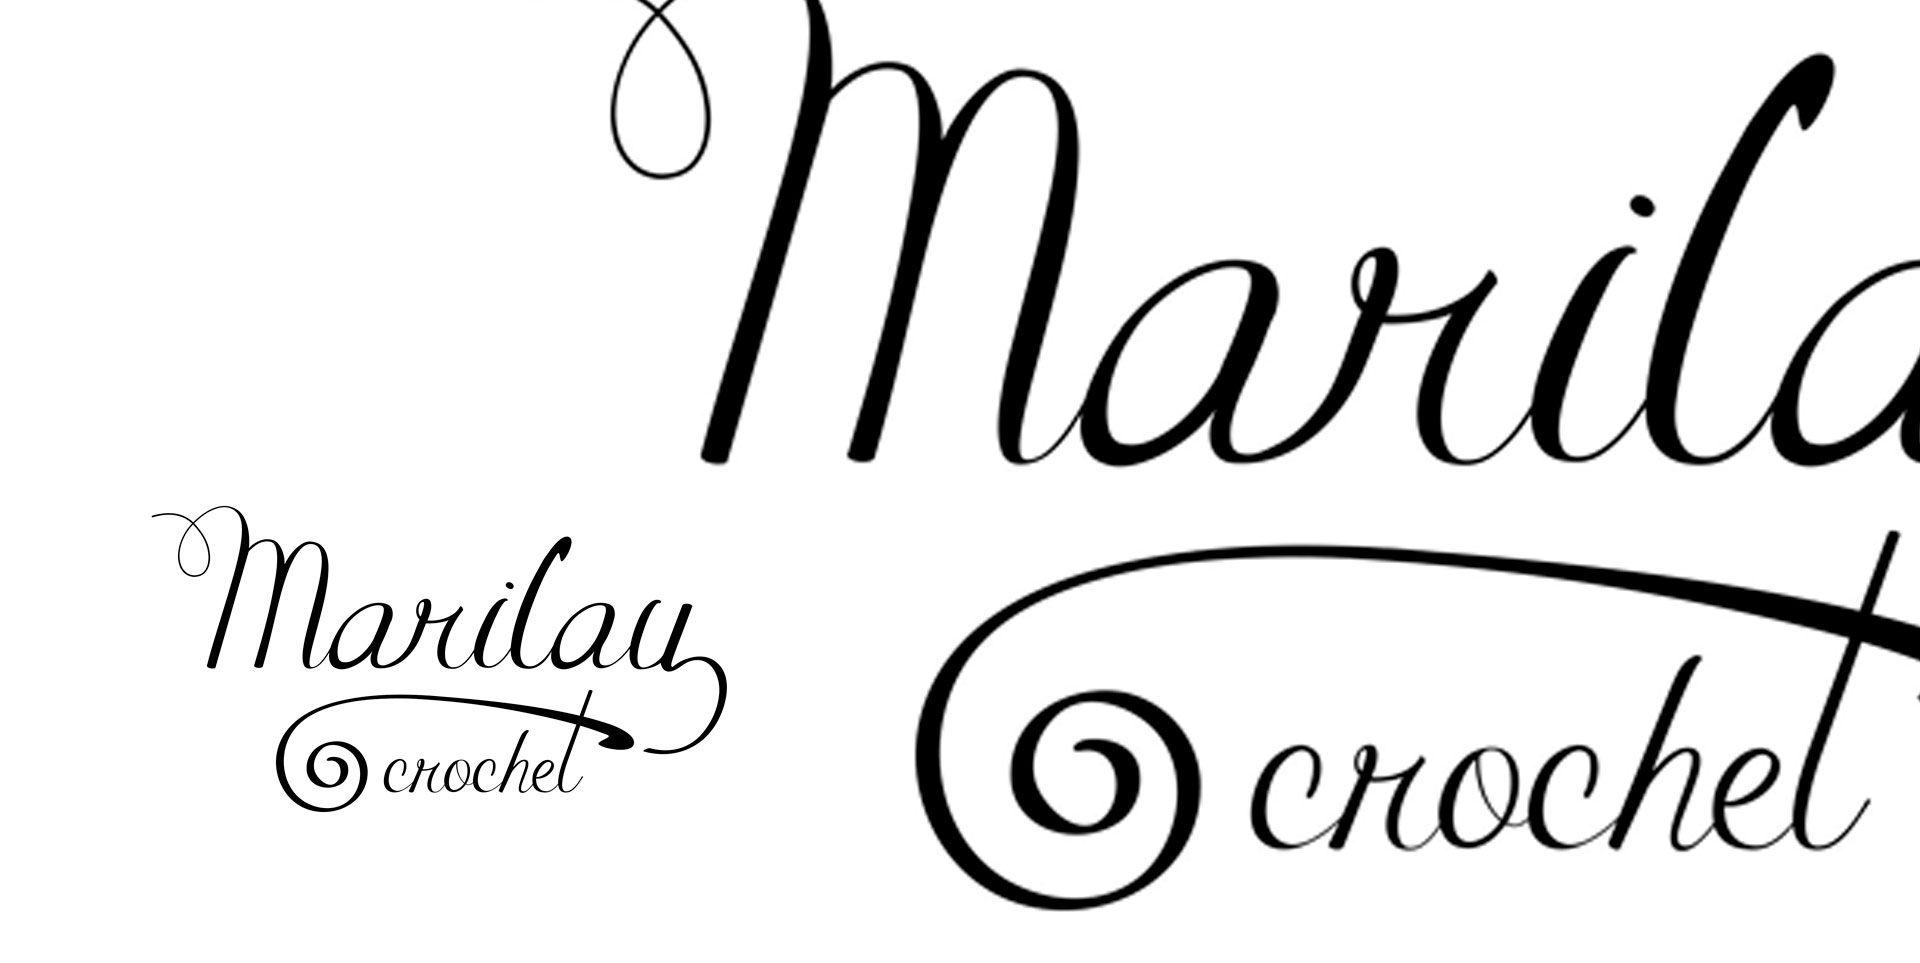 marilou-crochet-marca-001